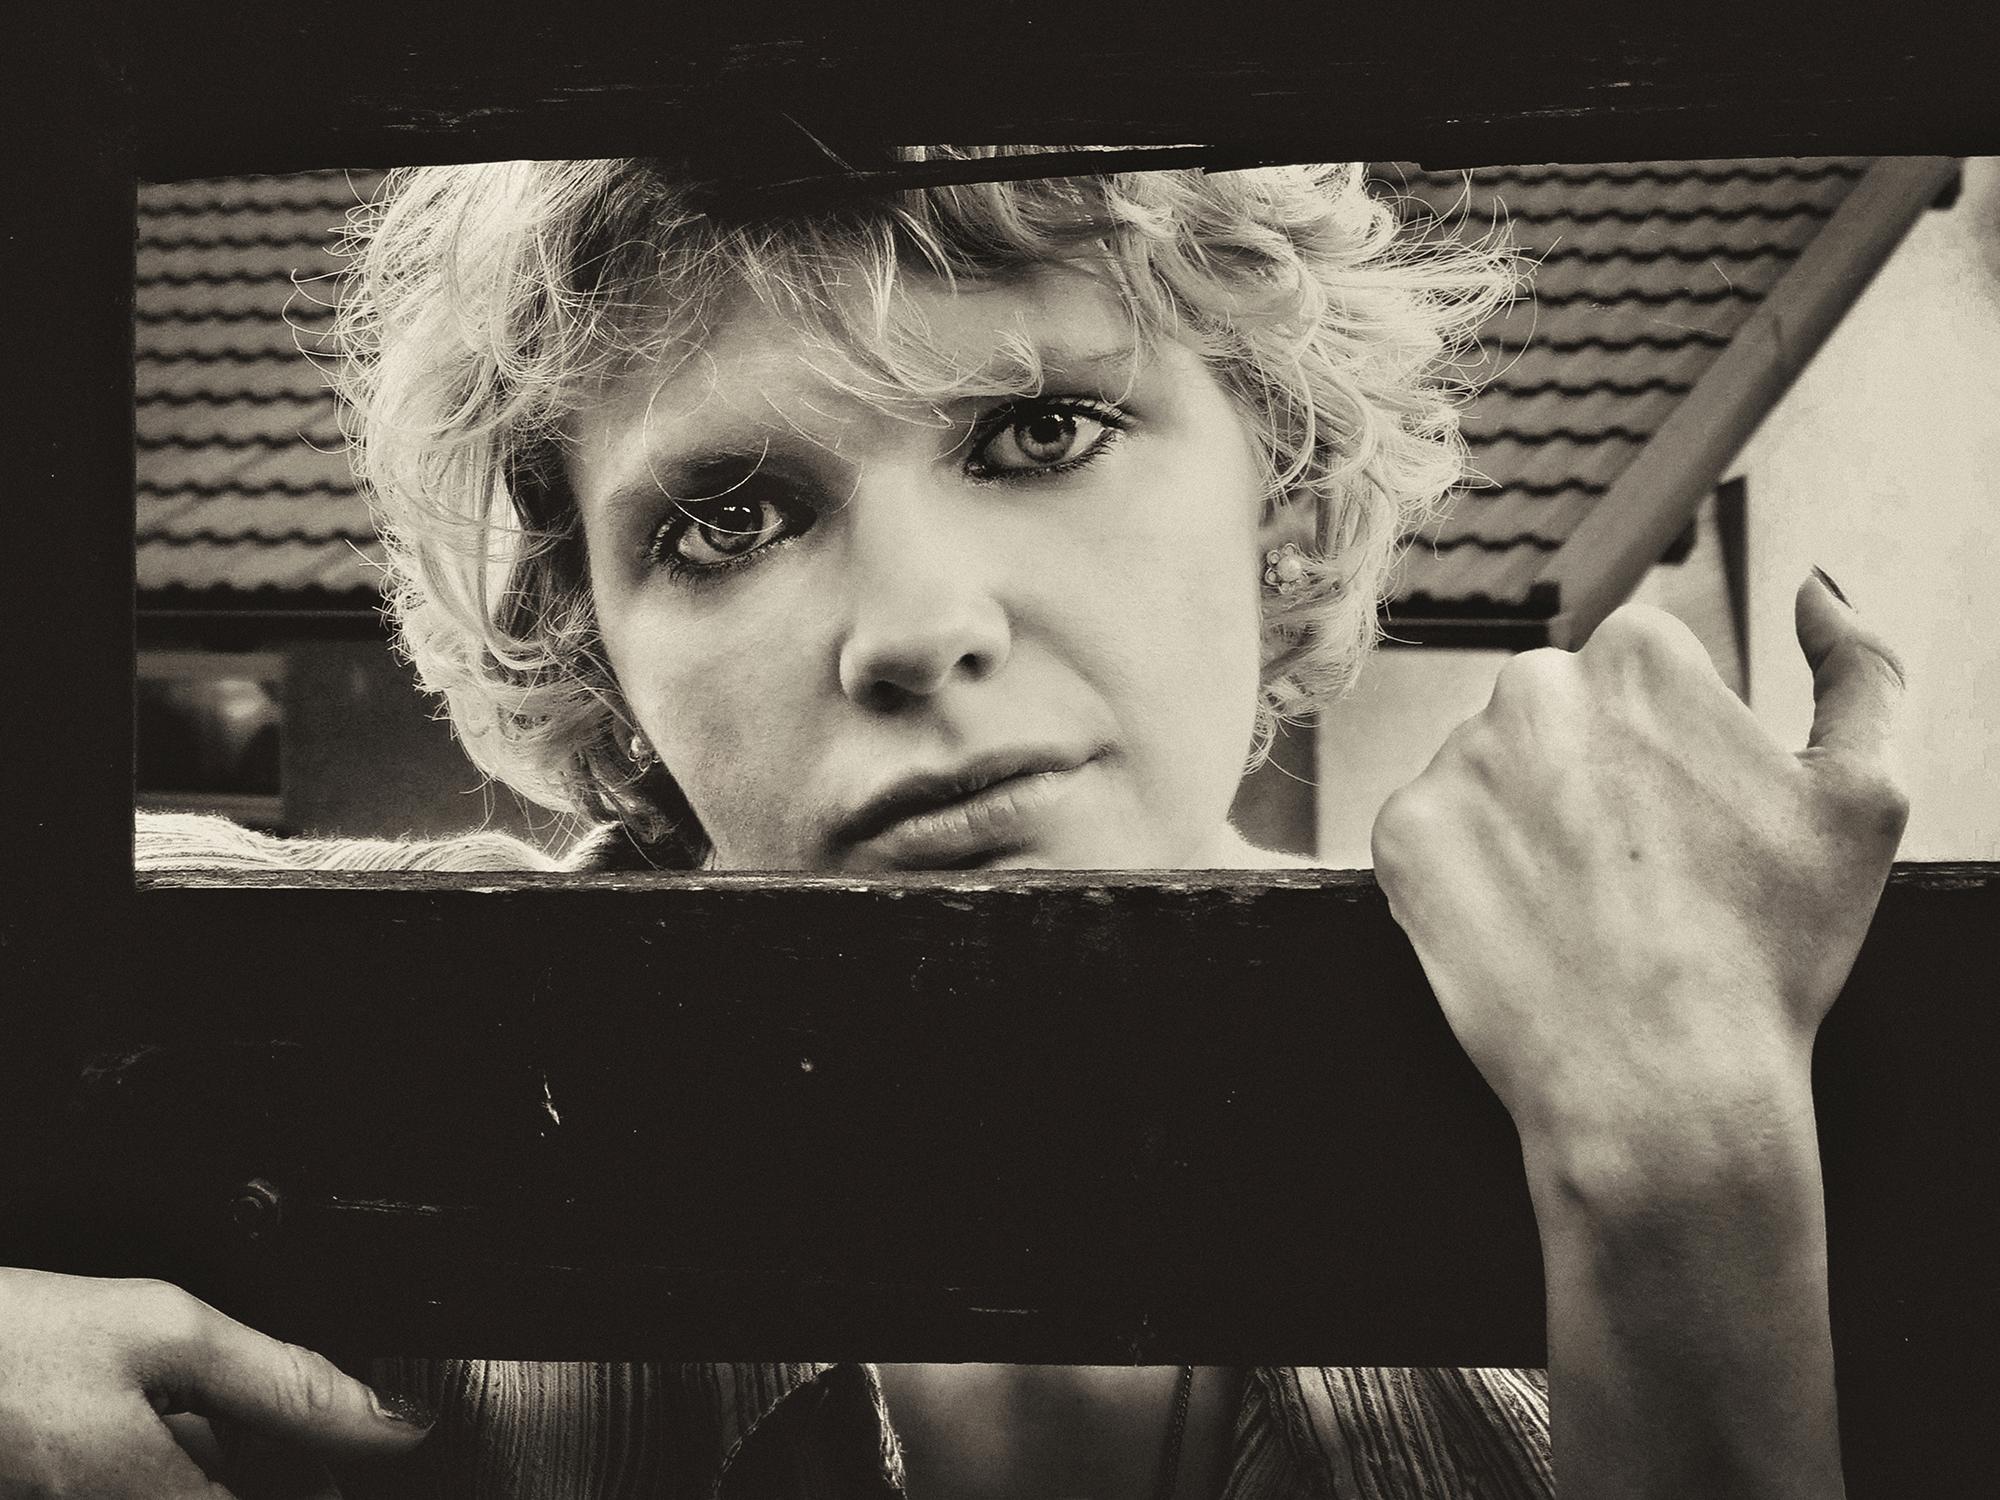 Karin Rosker